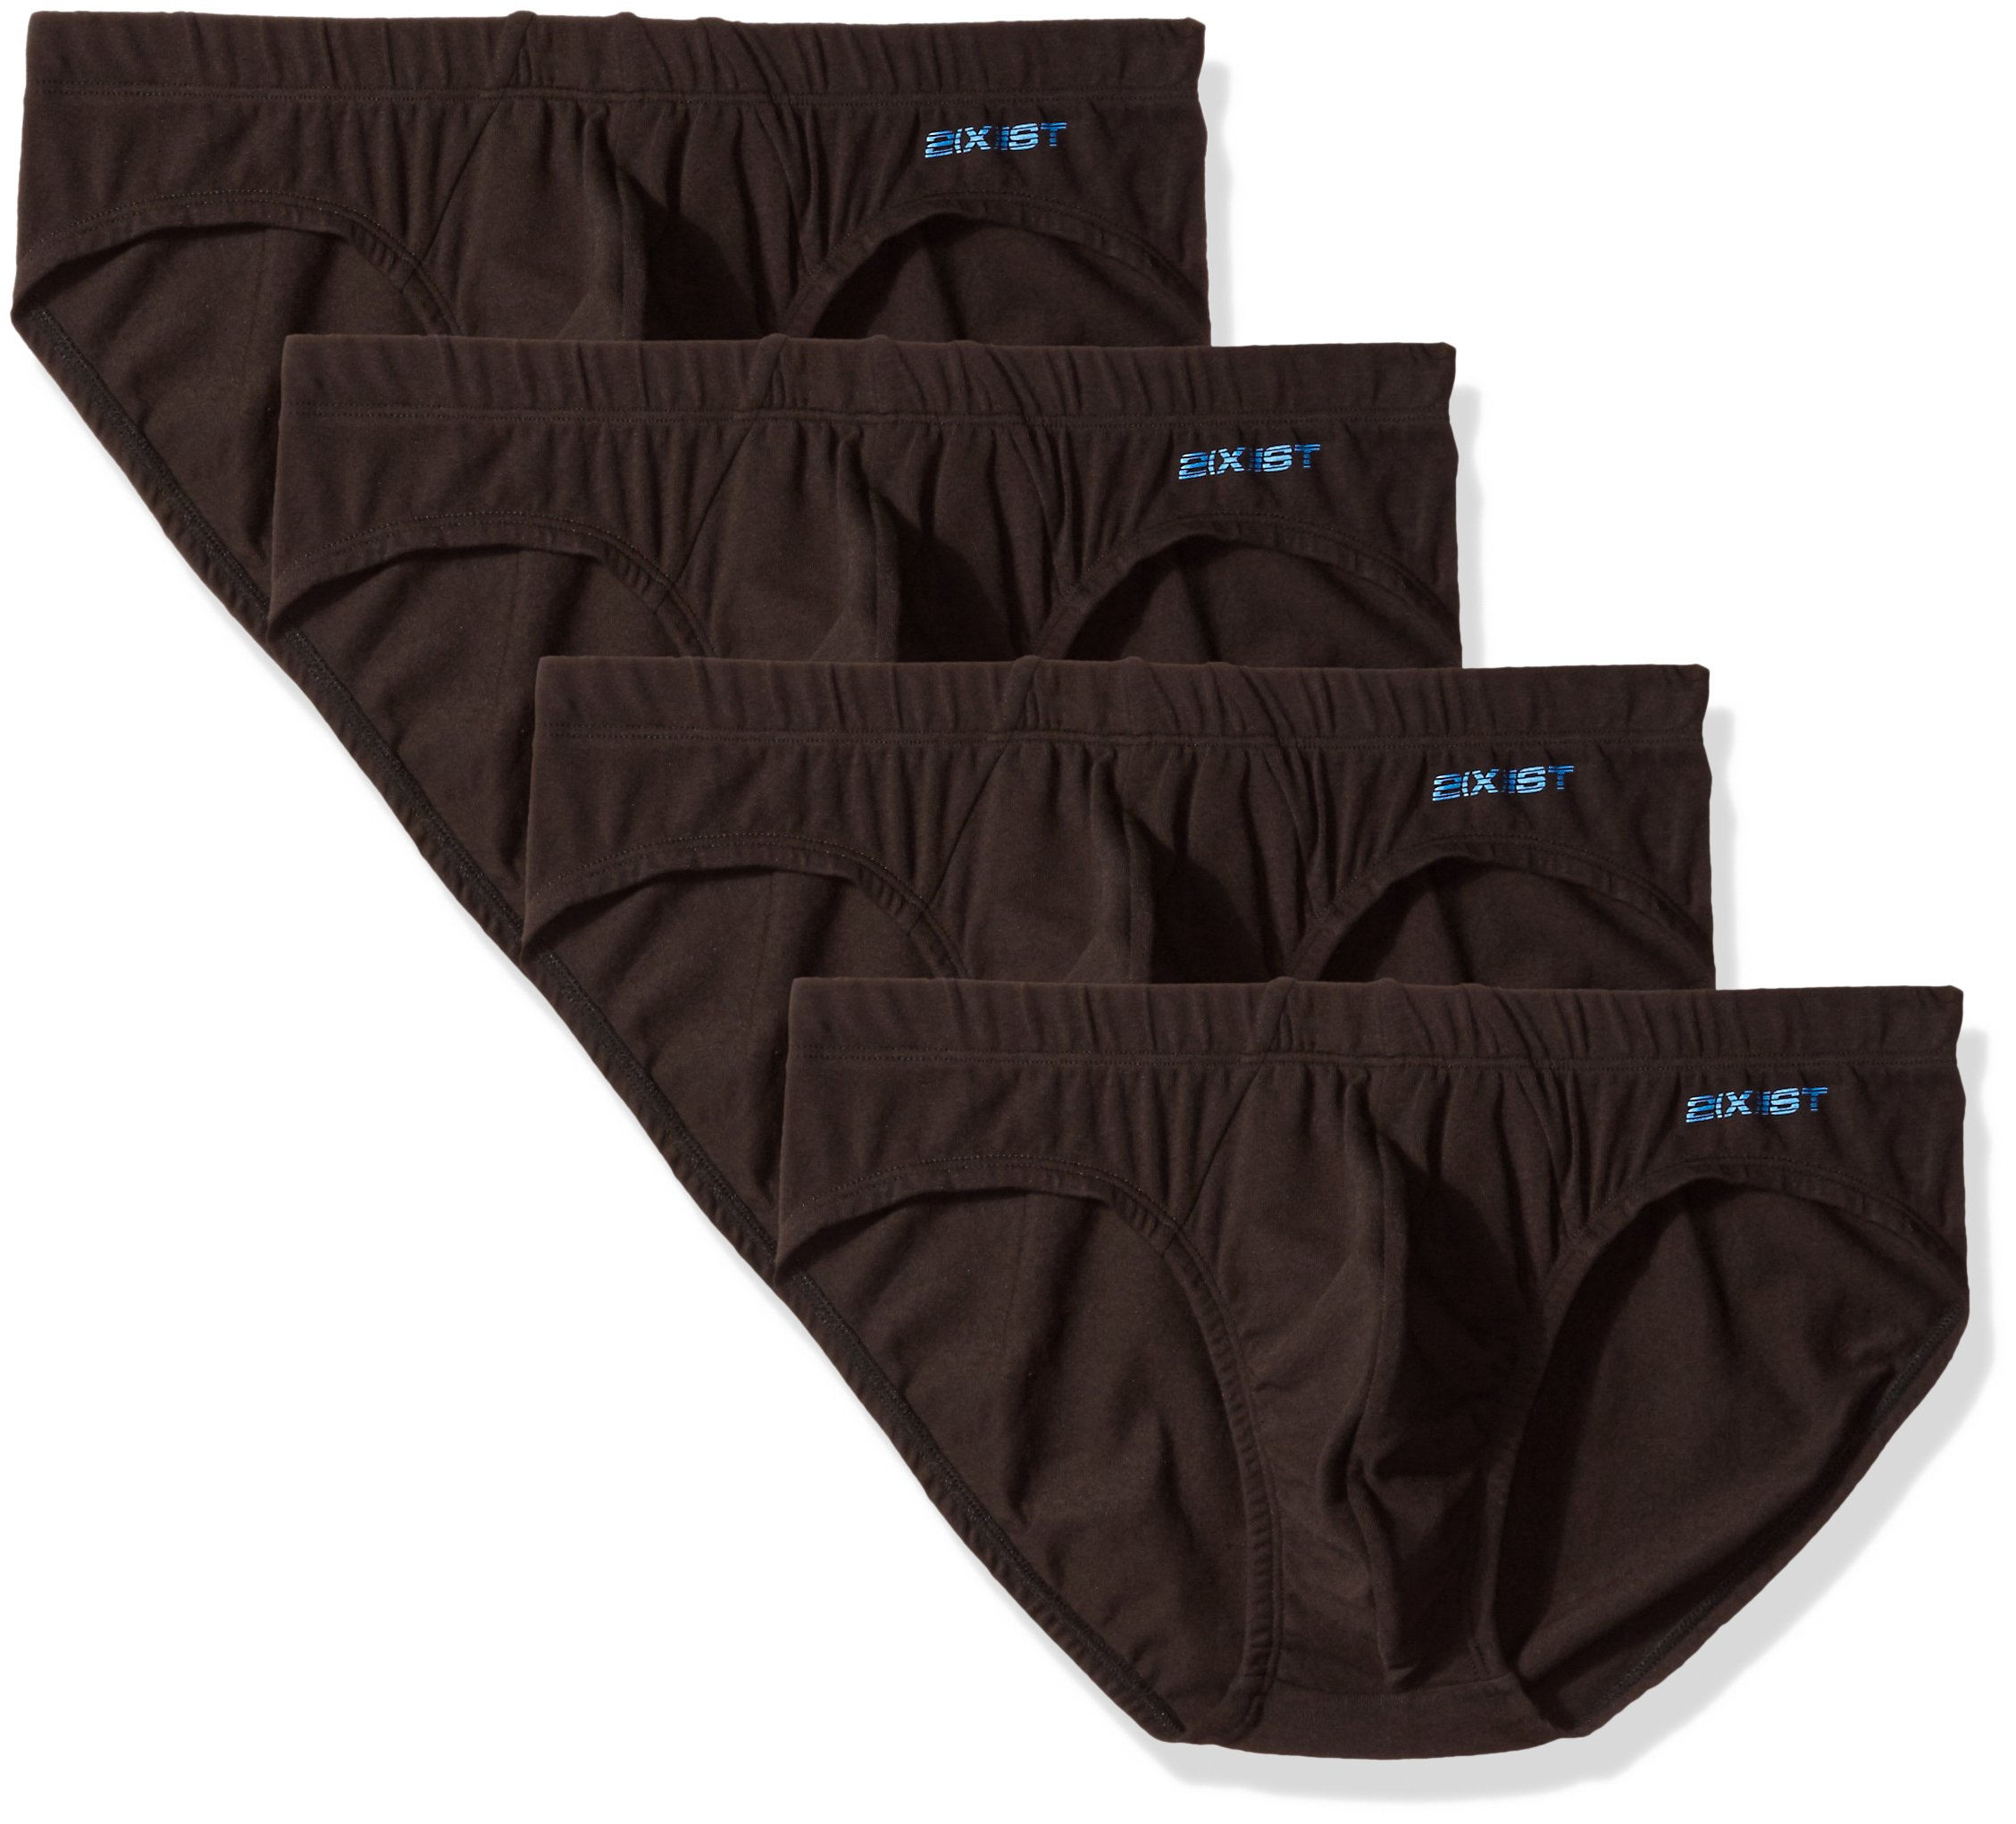 2(X)IST Men's Comfort Cotton Bikini Brief Multipack, Black, X-Large